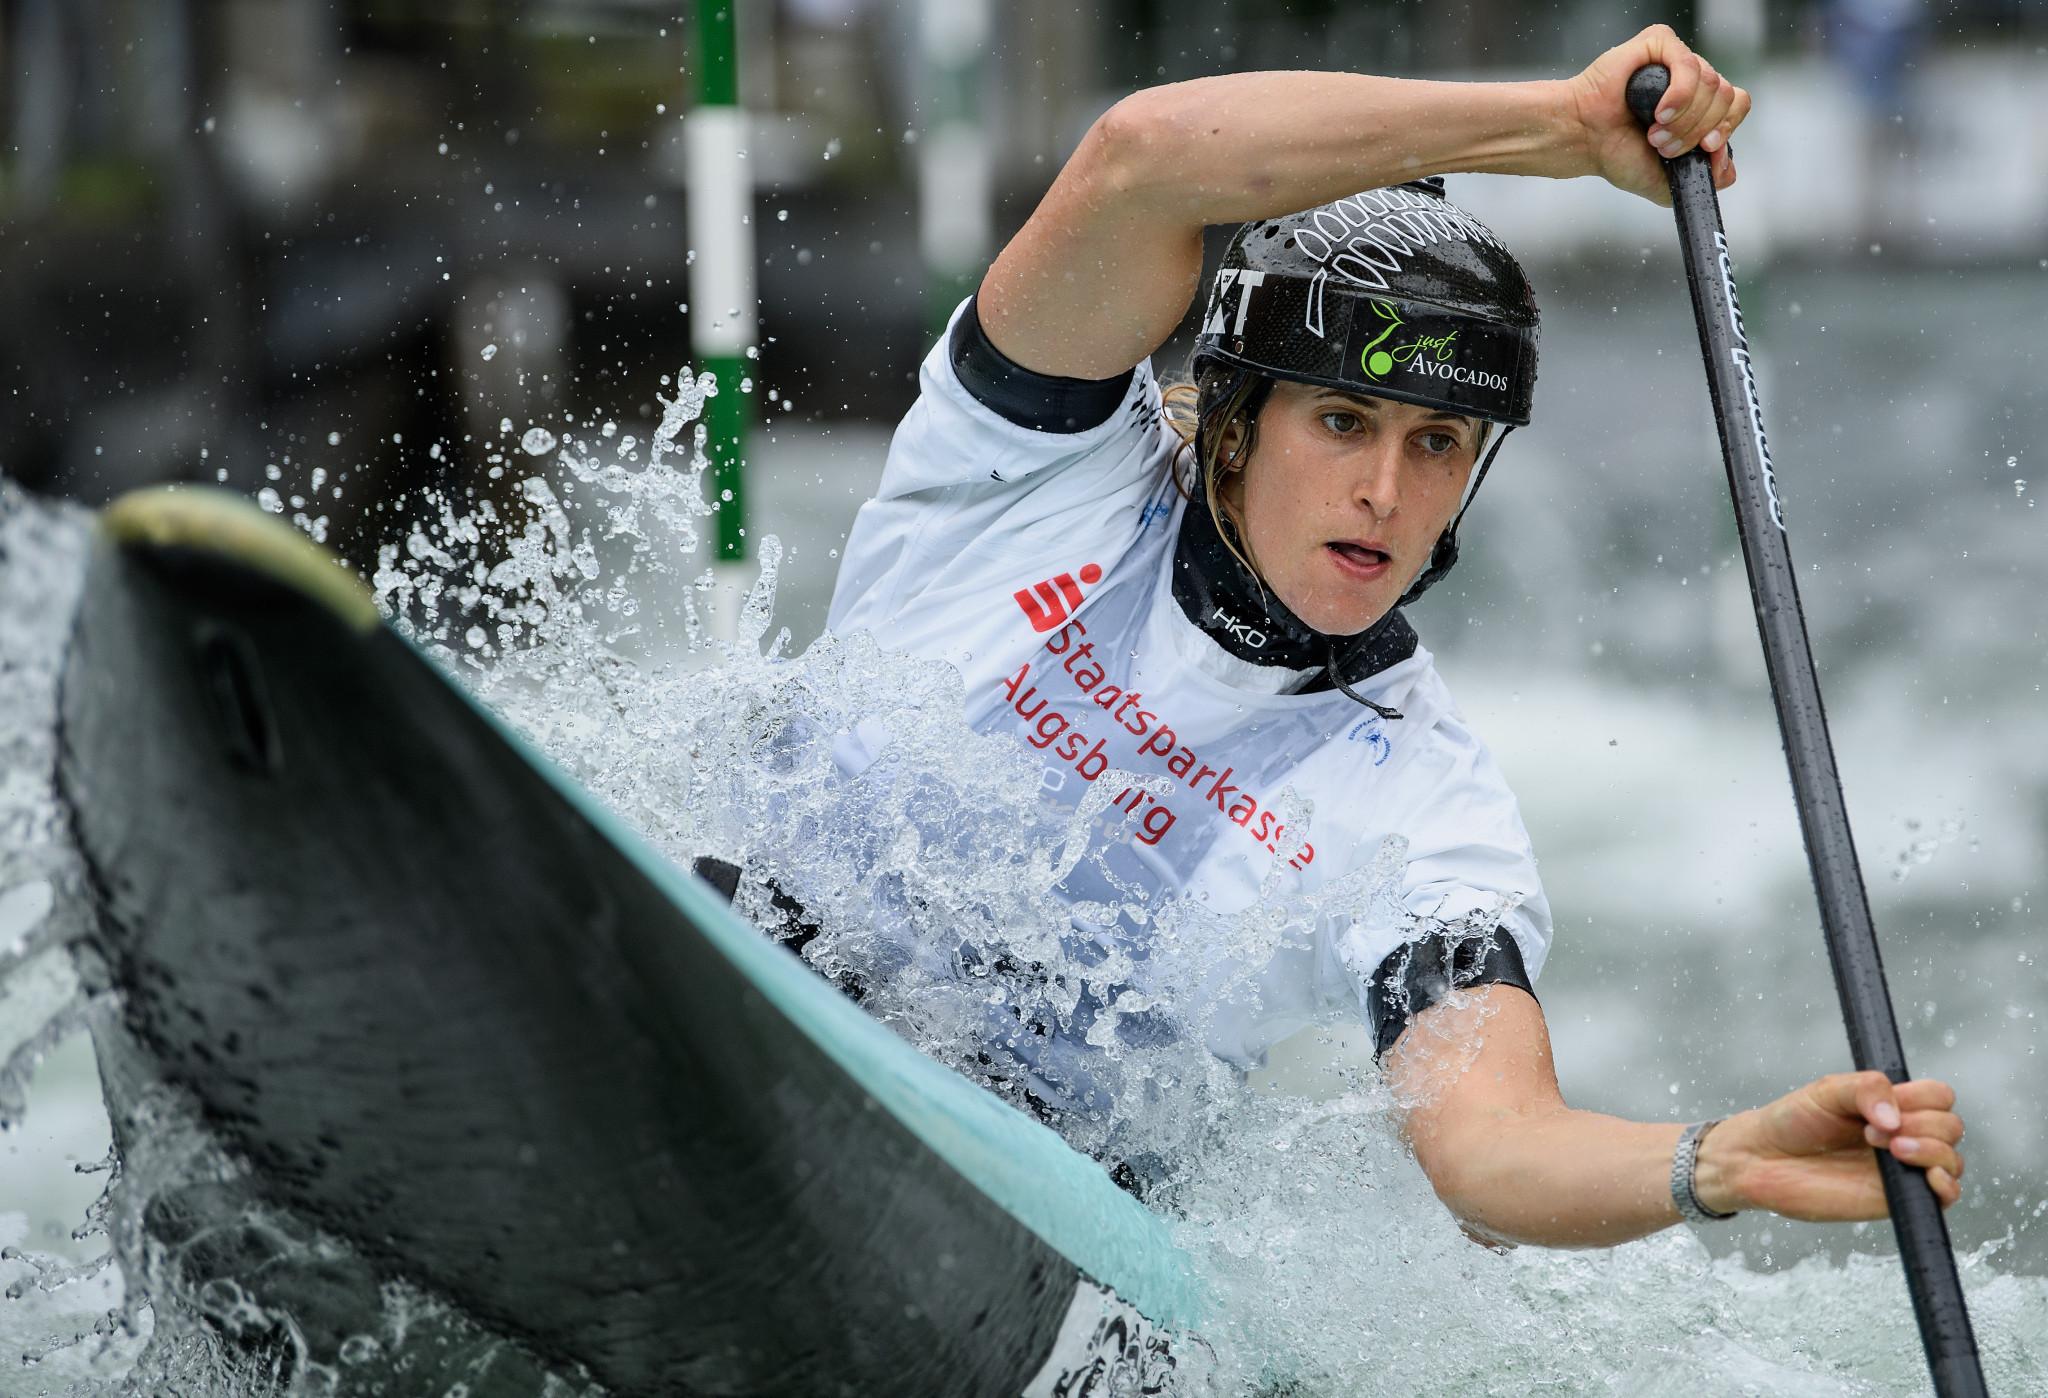 New Zealand's Jones among strong international field at home Oceania Canoe Slalom Championships